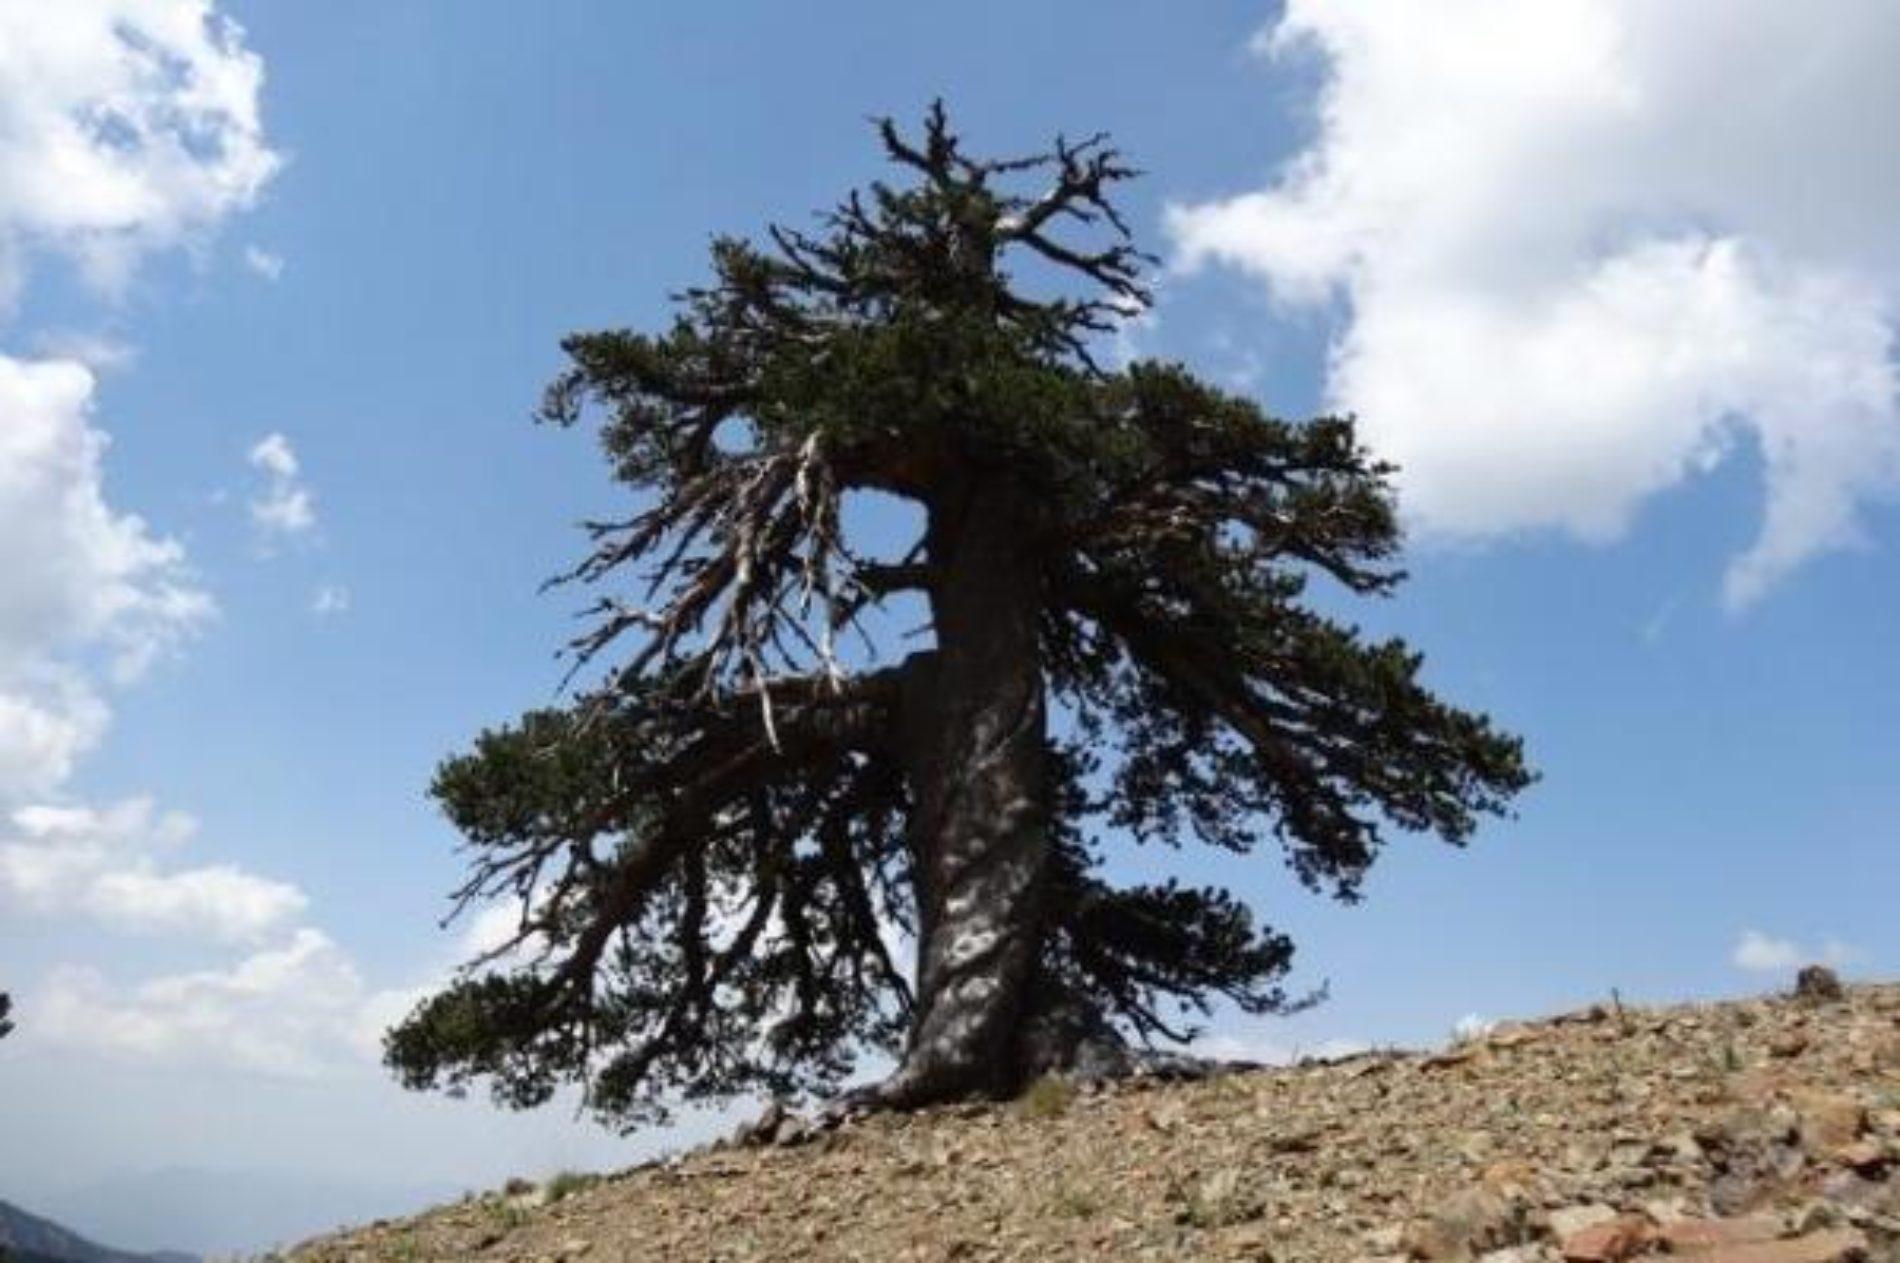 Novo otkriće: Bosanski bor je najstariji živi organizam u Evropi